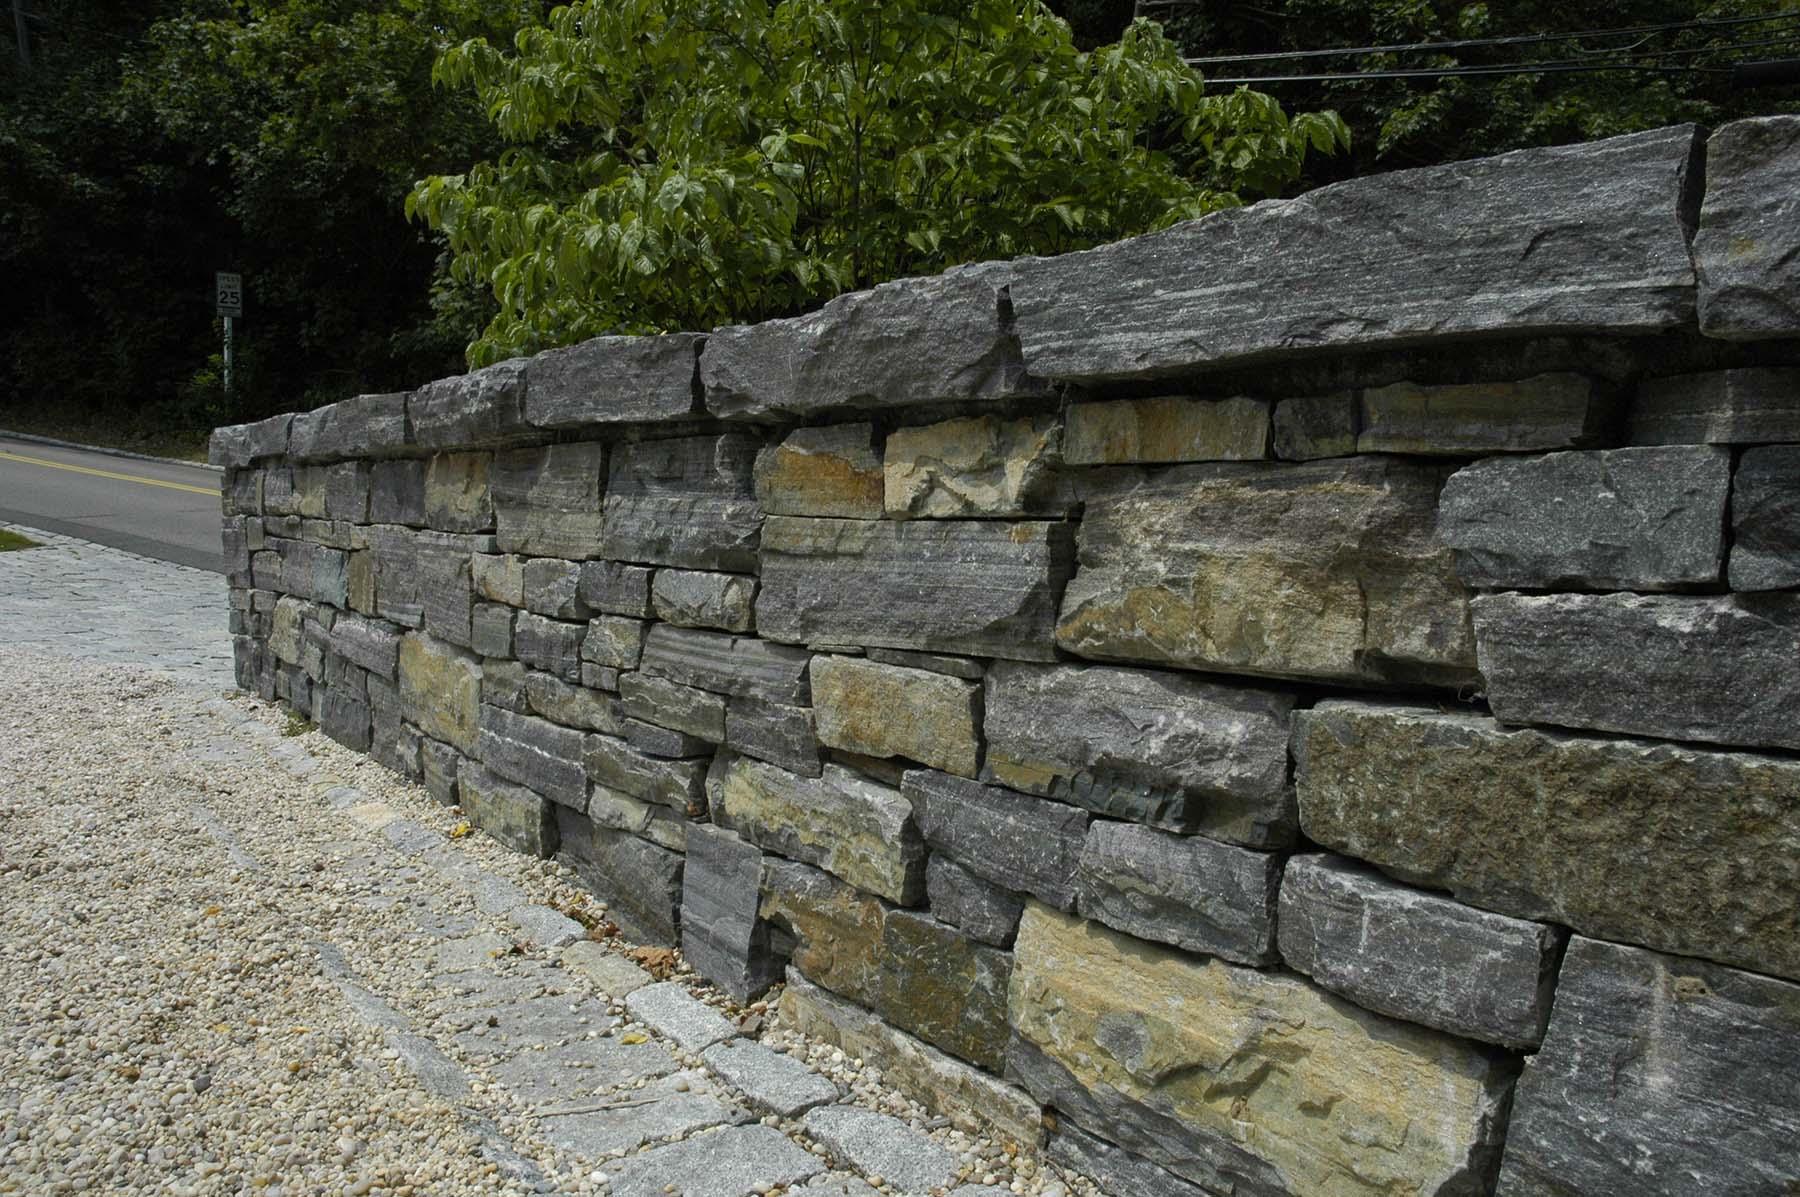 saratoga granite mosaic natural stone retaining wall outside